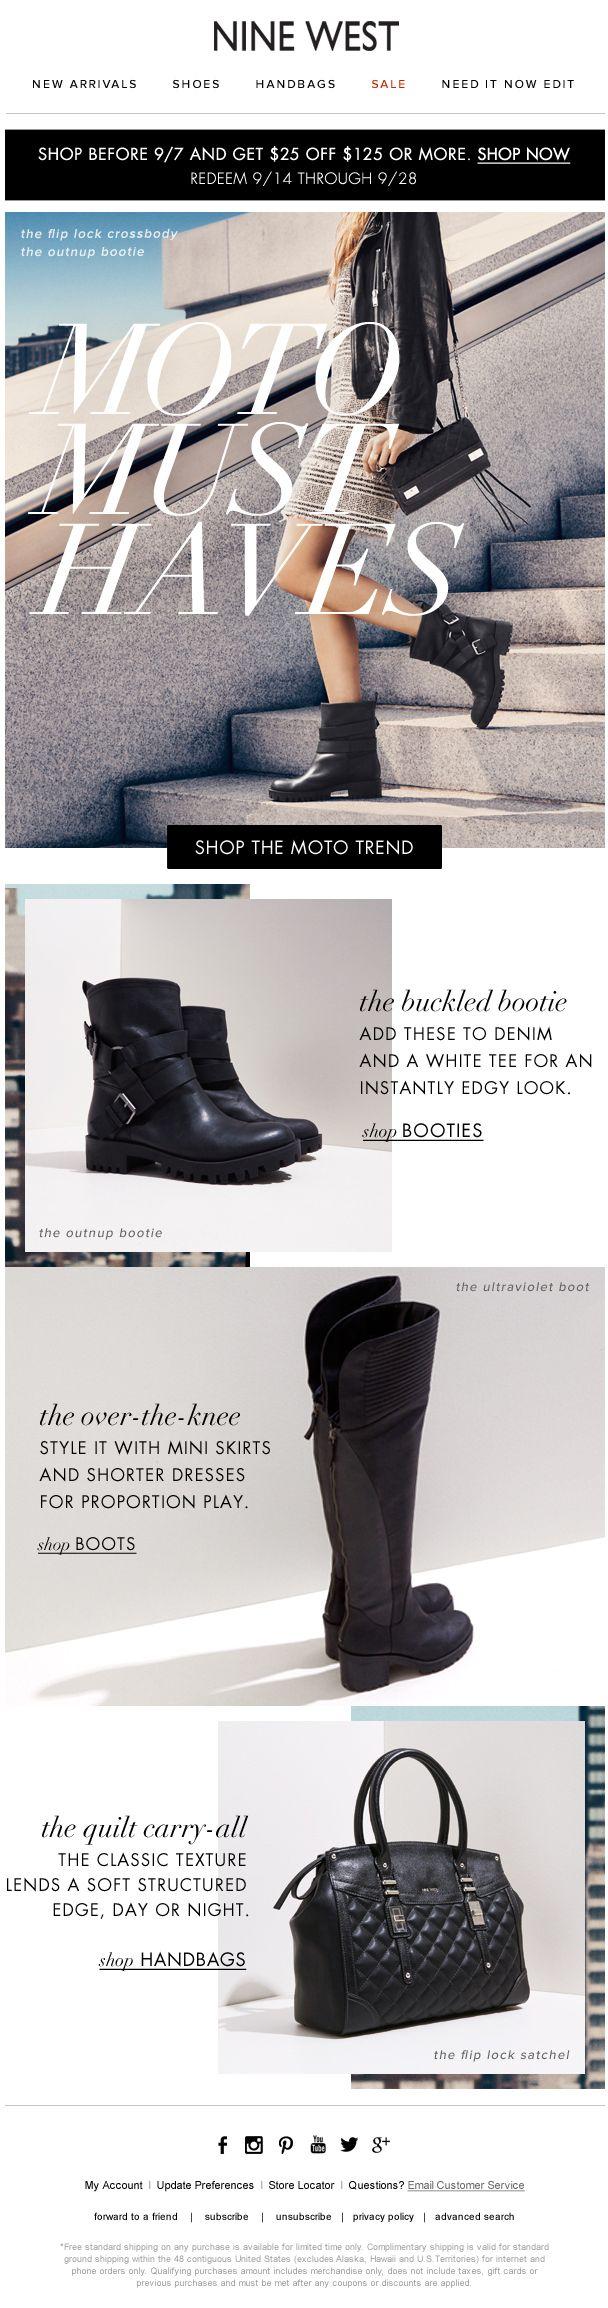 242 best newsletter design images by Creare Magazin Online on ...